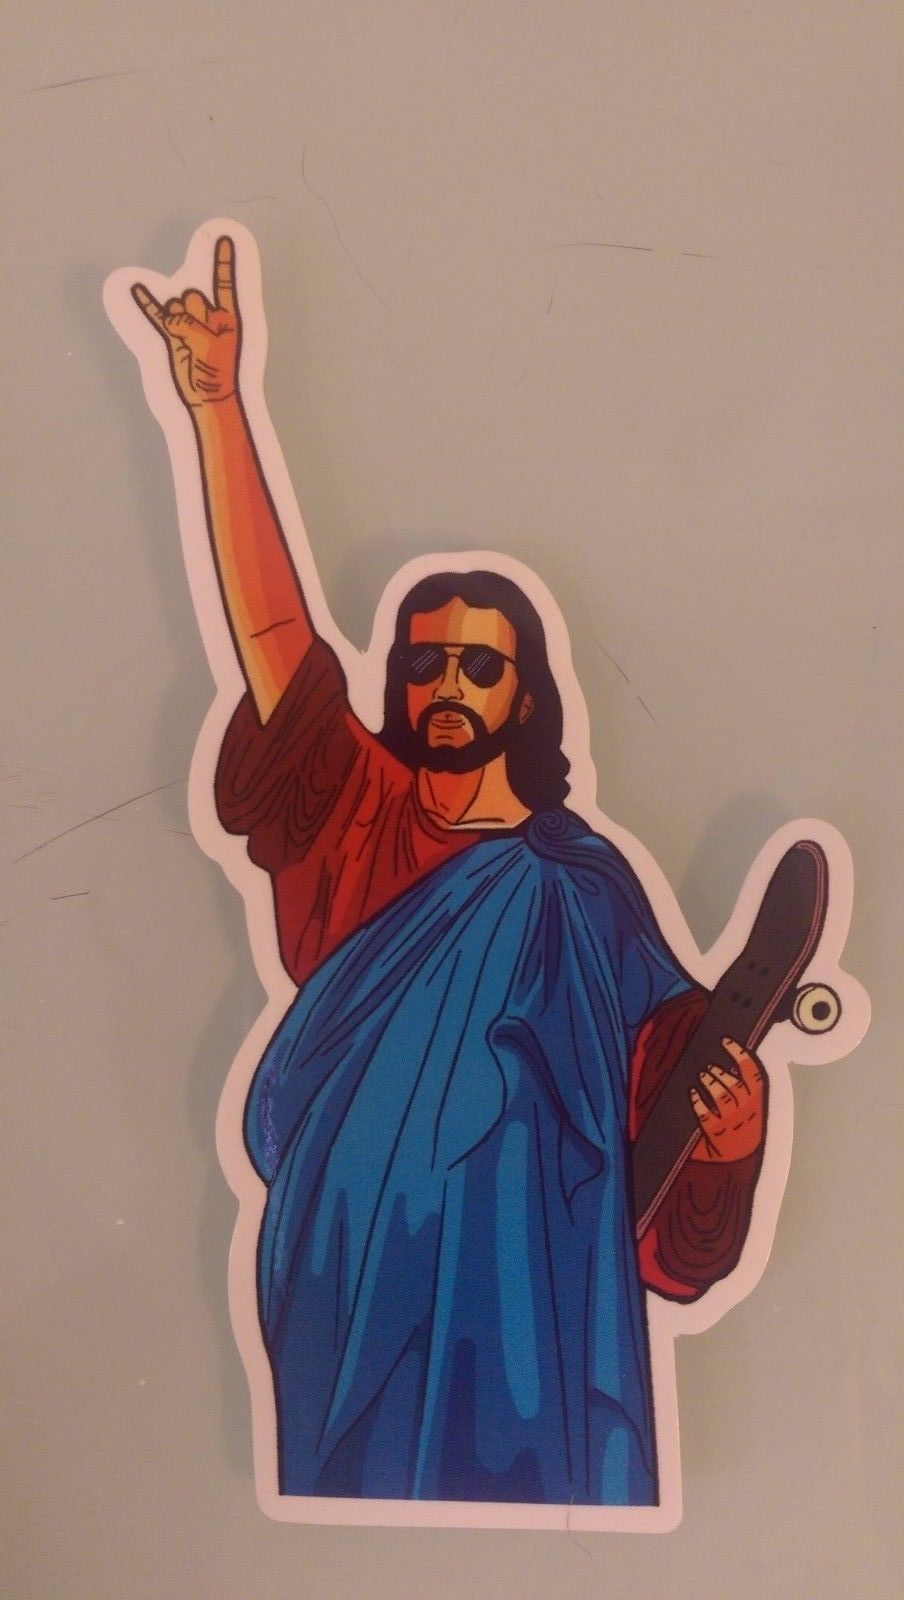 Jesus Rock Peace Love Sticker Skateboard Guitar Bike Car Vinyl Laptop Decal Ebay Graffiti Drawing Skateboard Stickers Skate Art